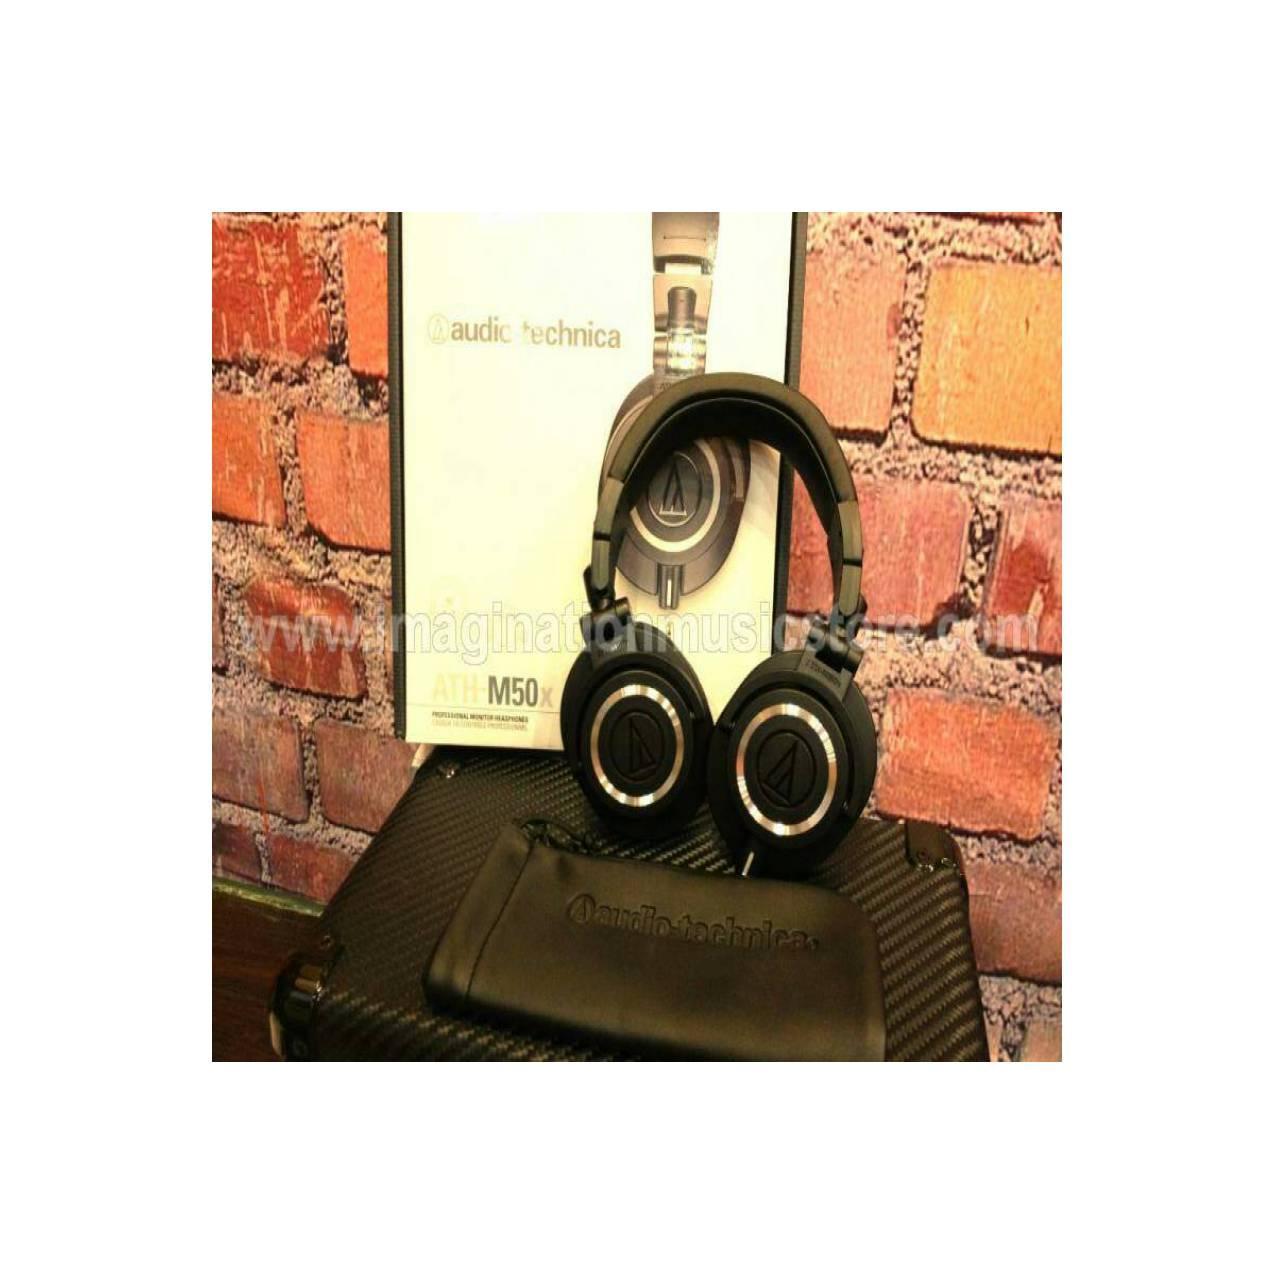 Audio Technica M50x Hitam Spec Dan Daftar Harga Terbaru Indonesia Ath Professional Monitor Headphones Source Headphone